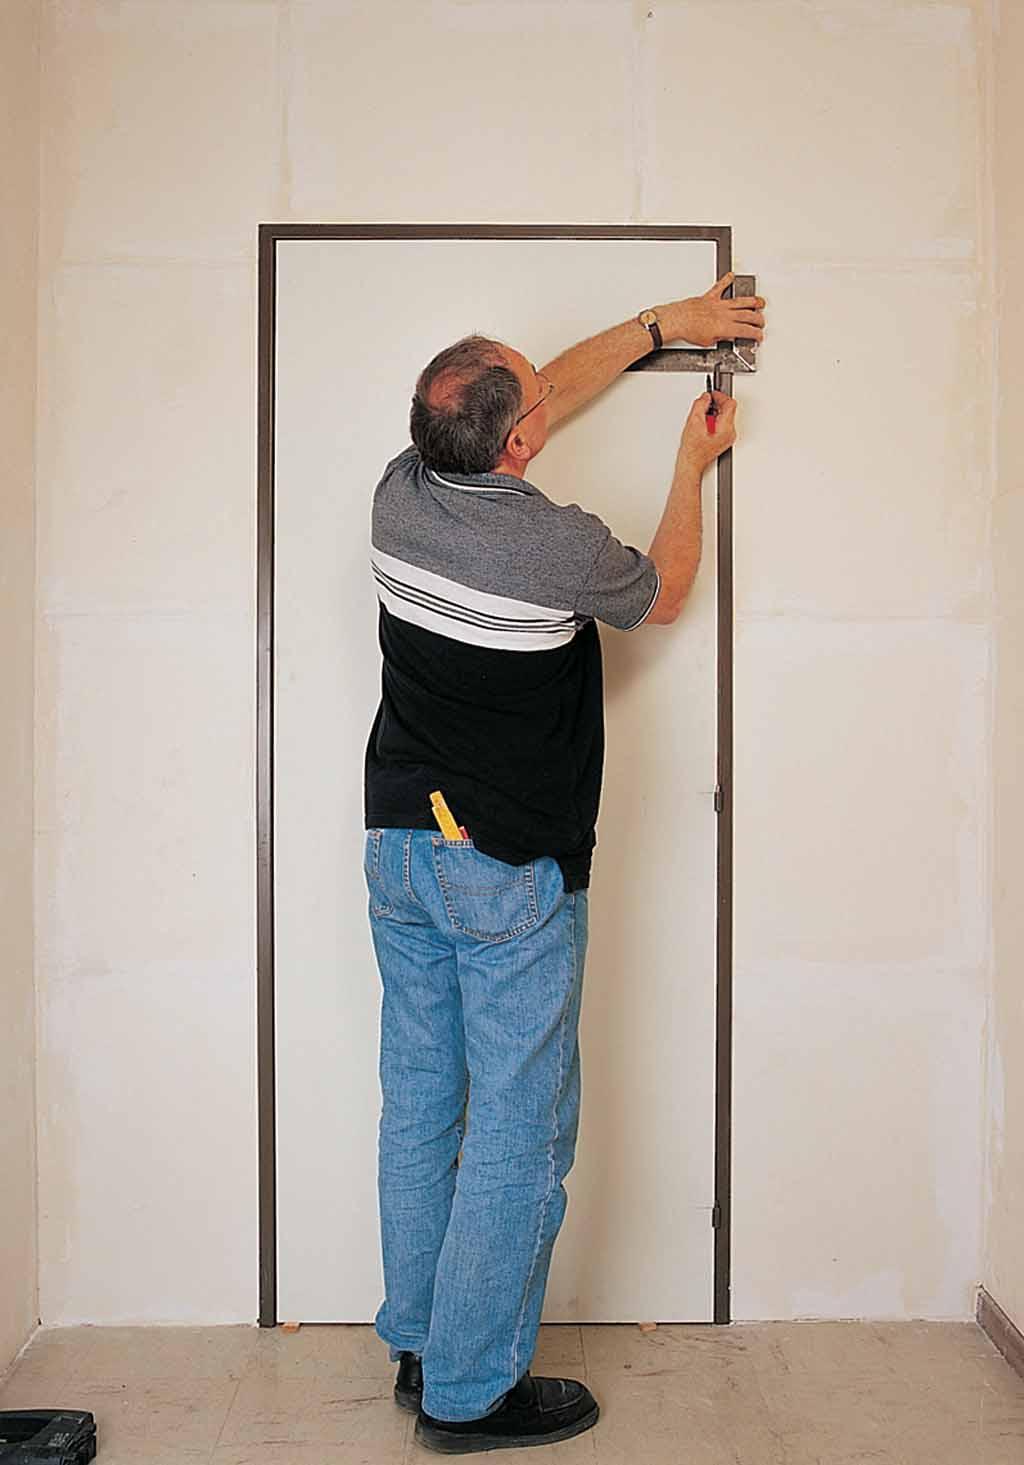 poser une porte dans une huisserie m tallique diy family. Black Bedroom Furniture Sets. Home Design Ideas